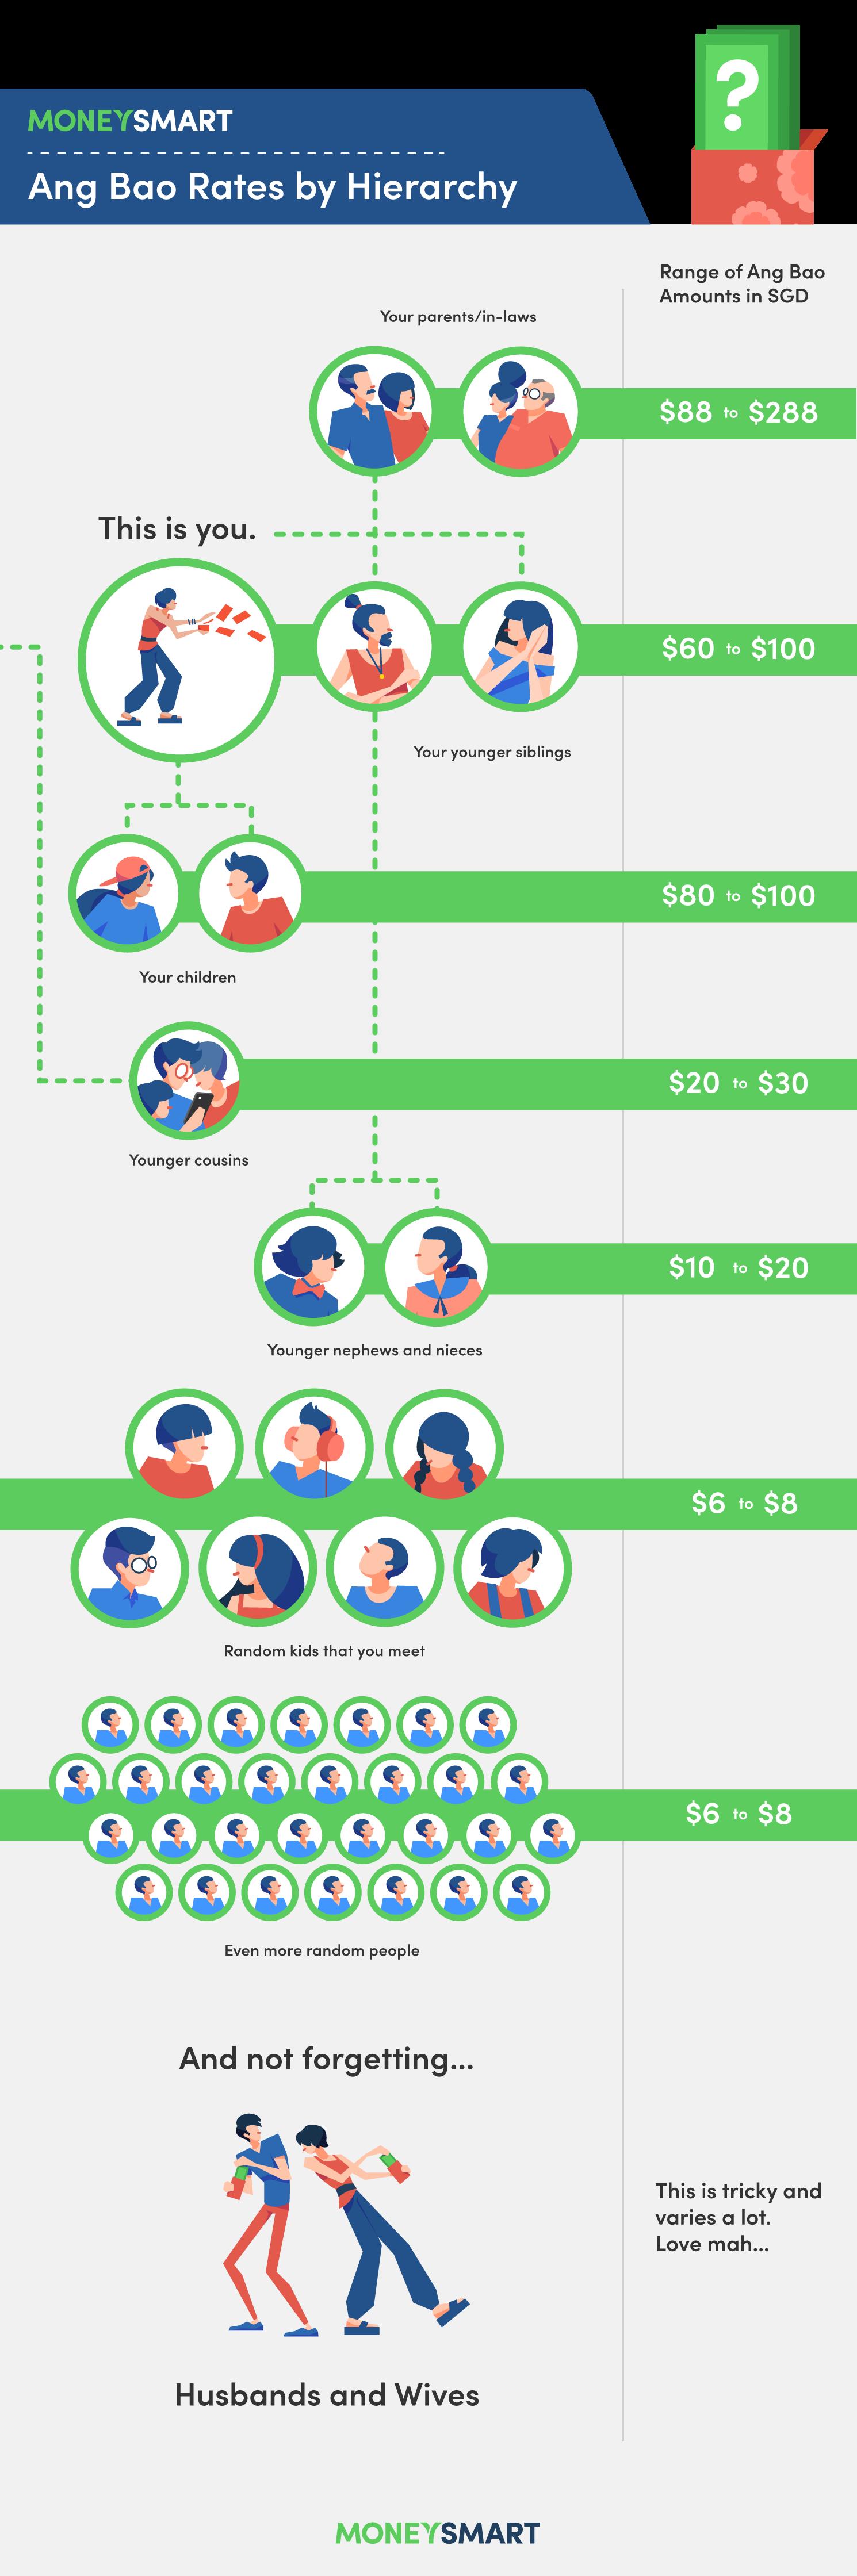 CNY Ang Bao rates